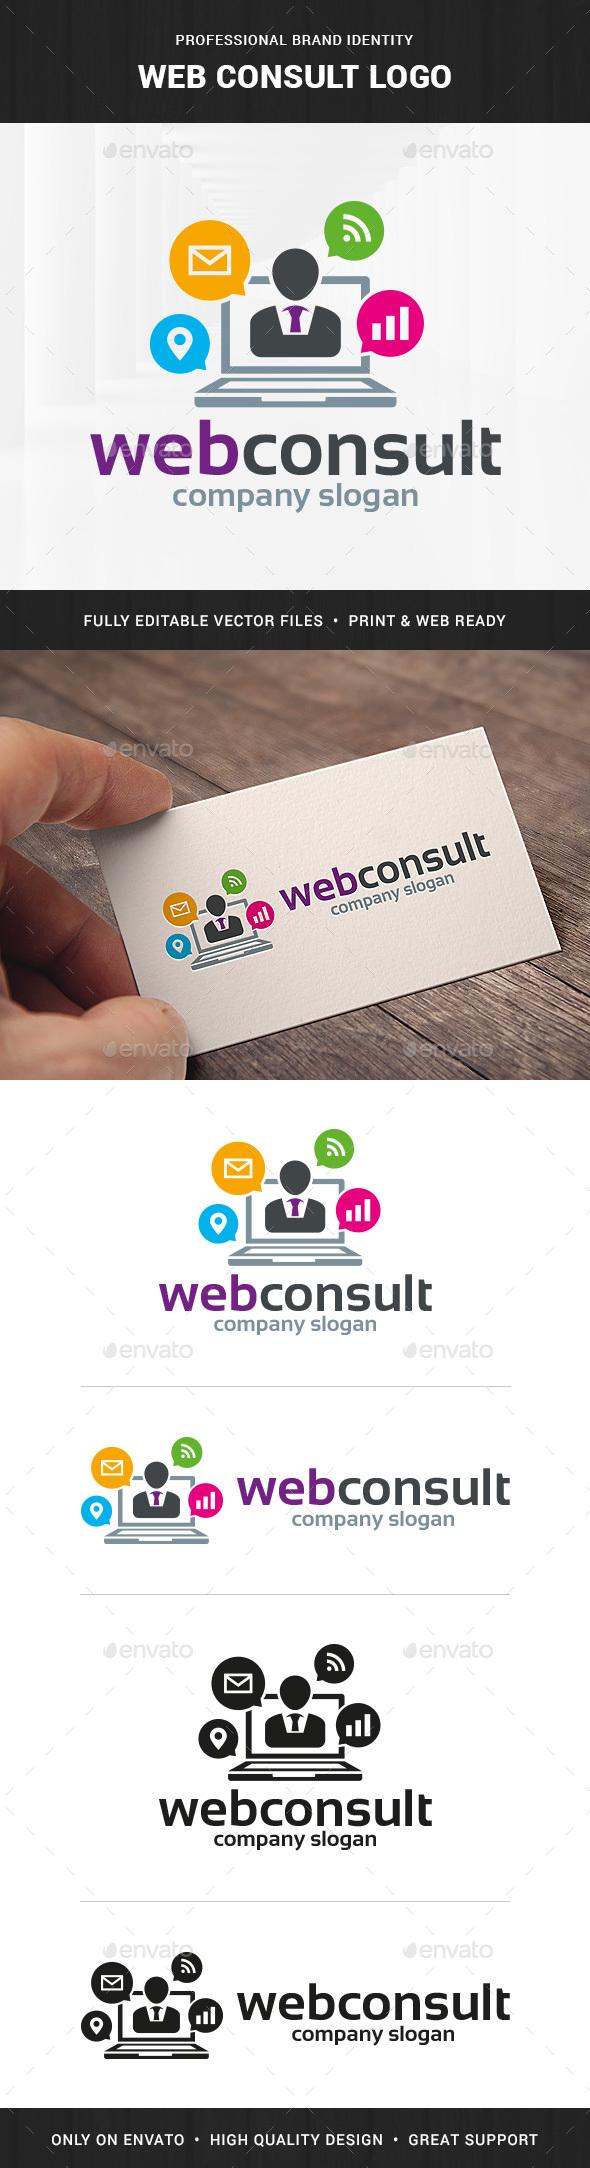 Web Consult Logo Template - Symbols Logo Templates